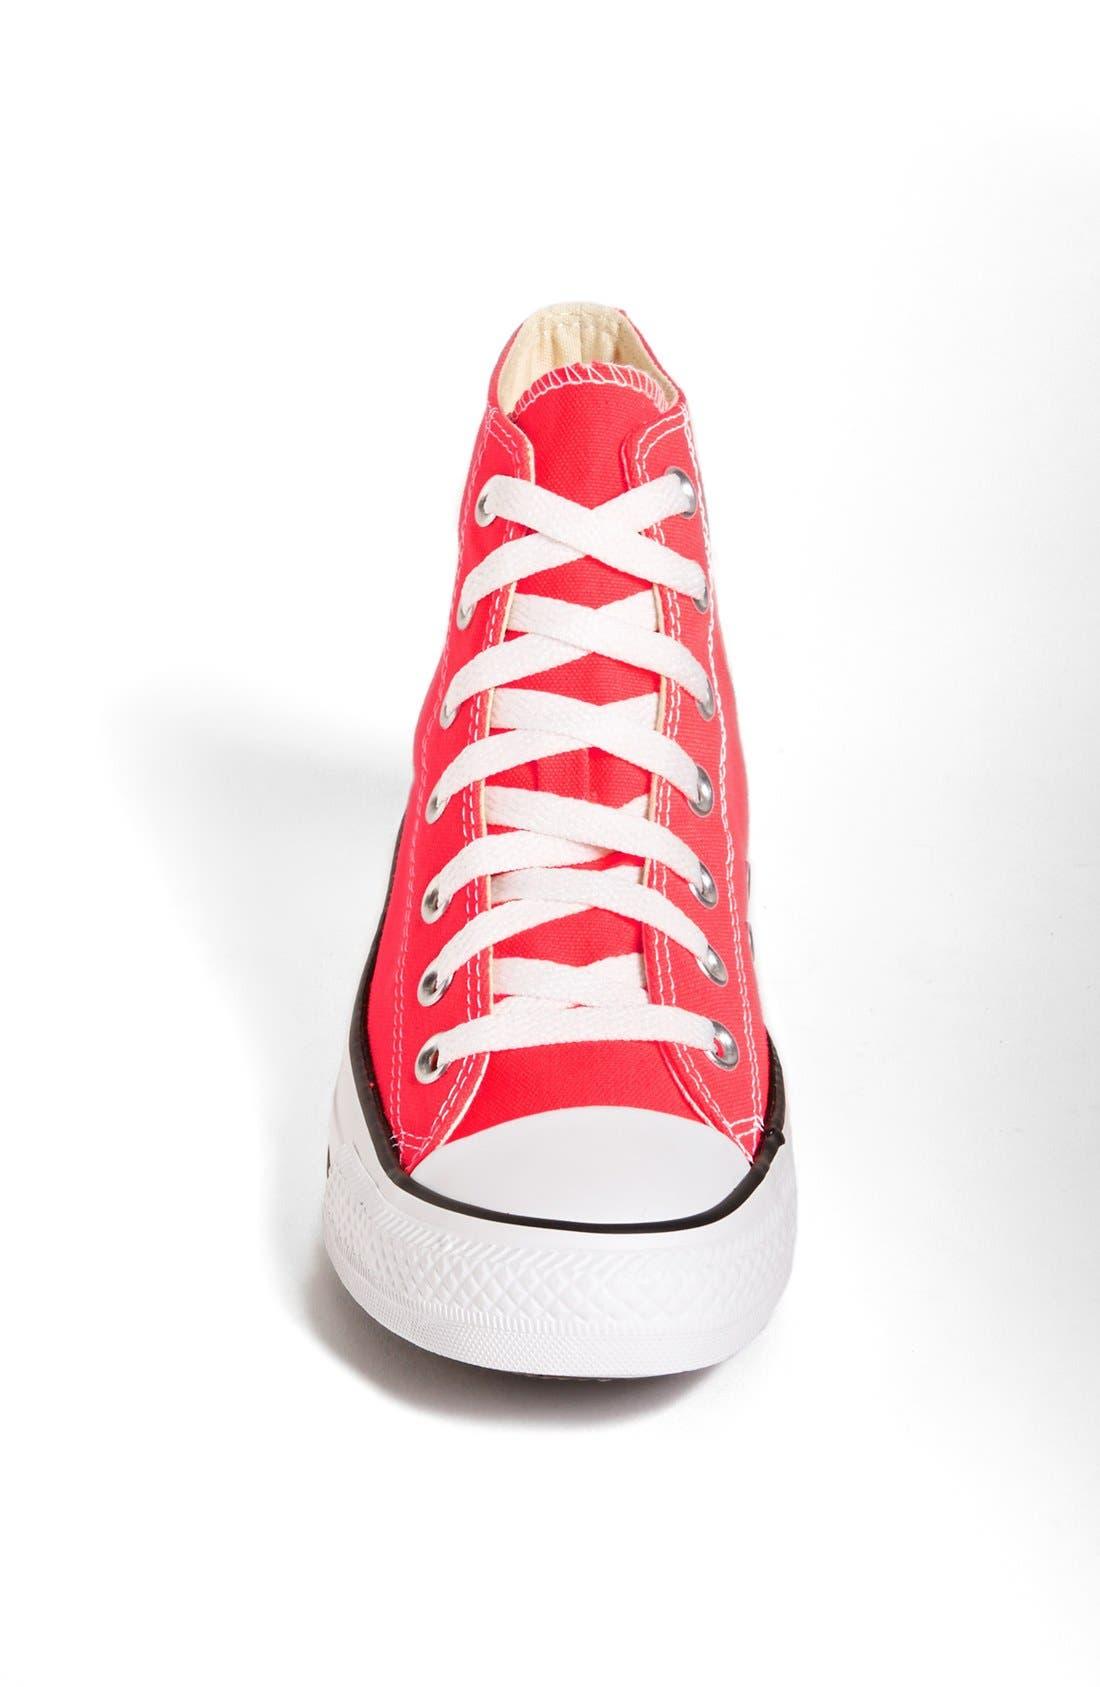 Alternate Image 3  - Converse Chuck Taylor® All Star® 'Fiery Coral' High Top Sneaker (Women)